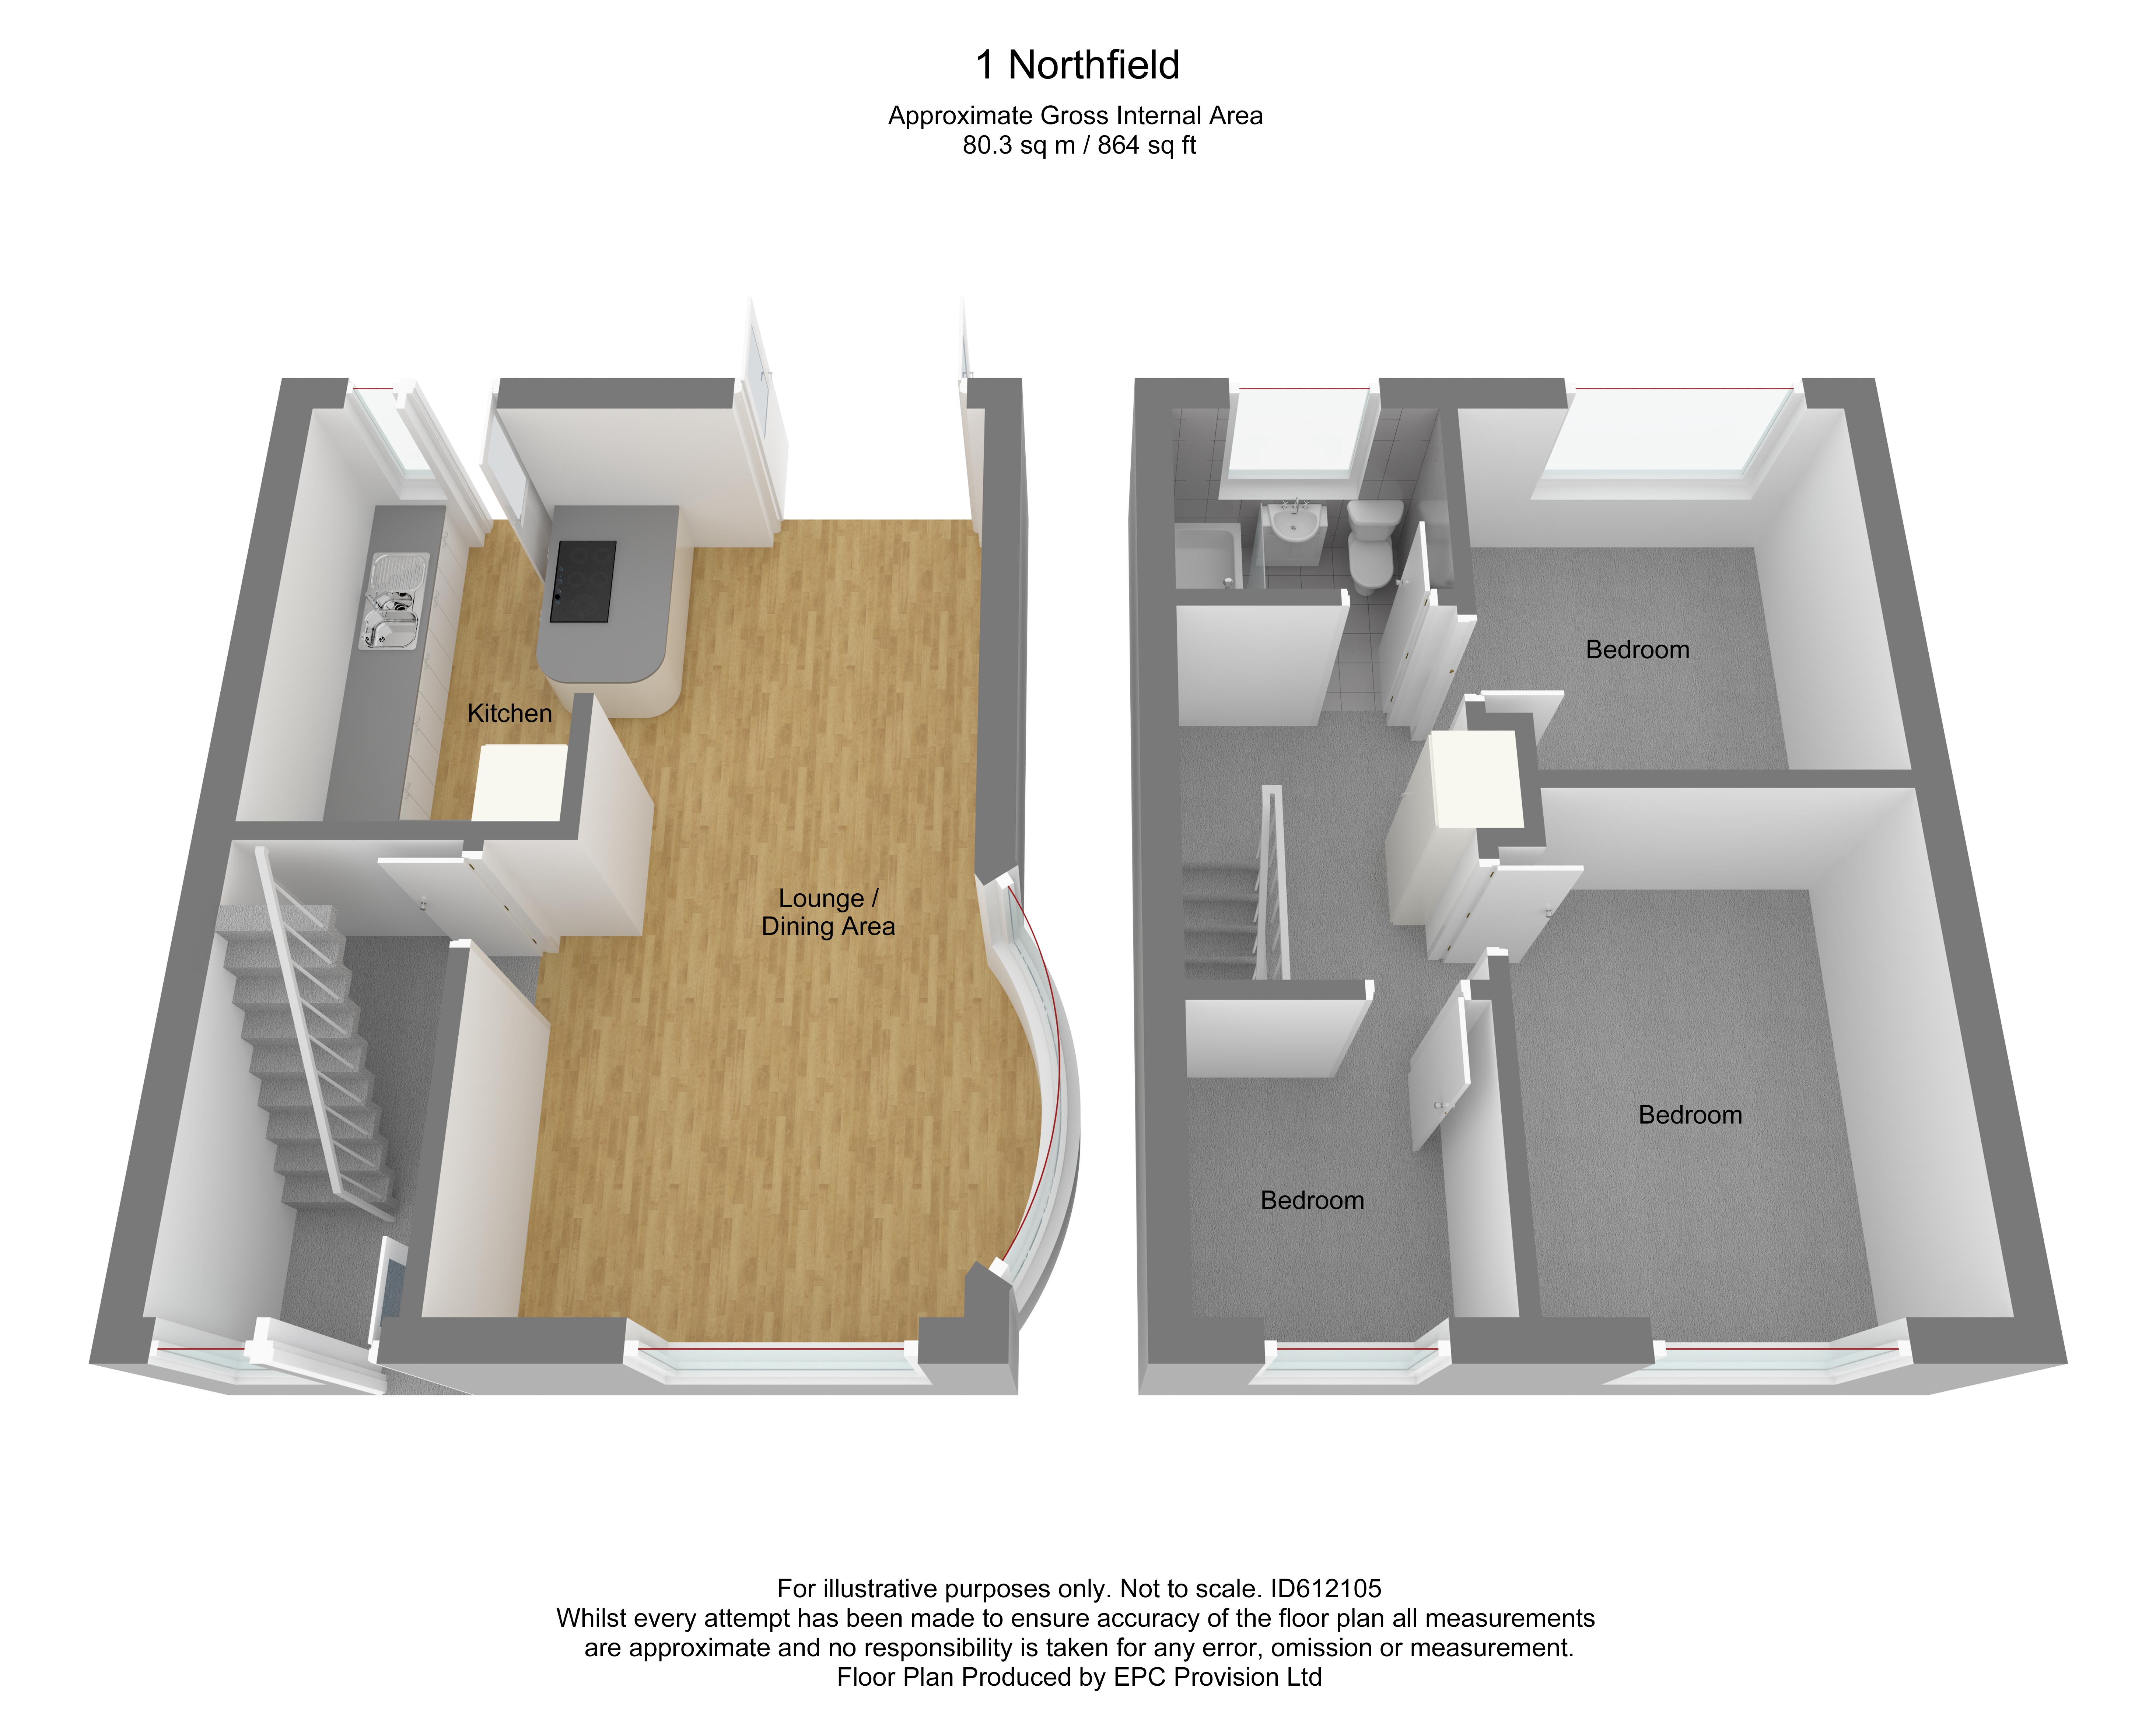 Floorplan for Northfield, Yate.